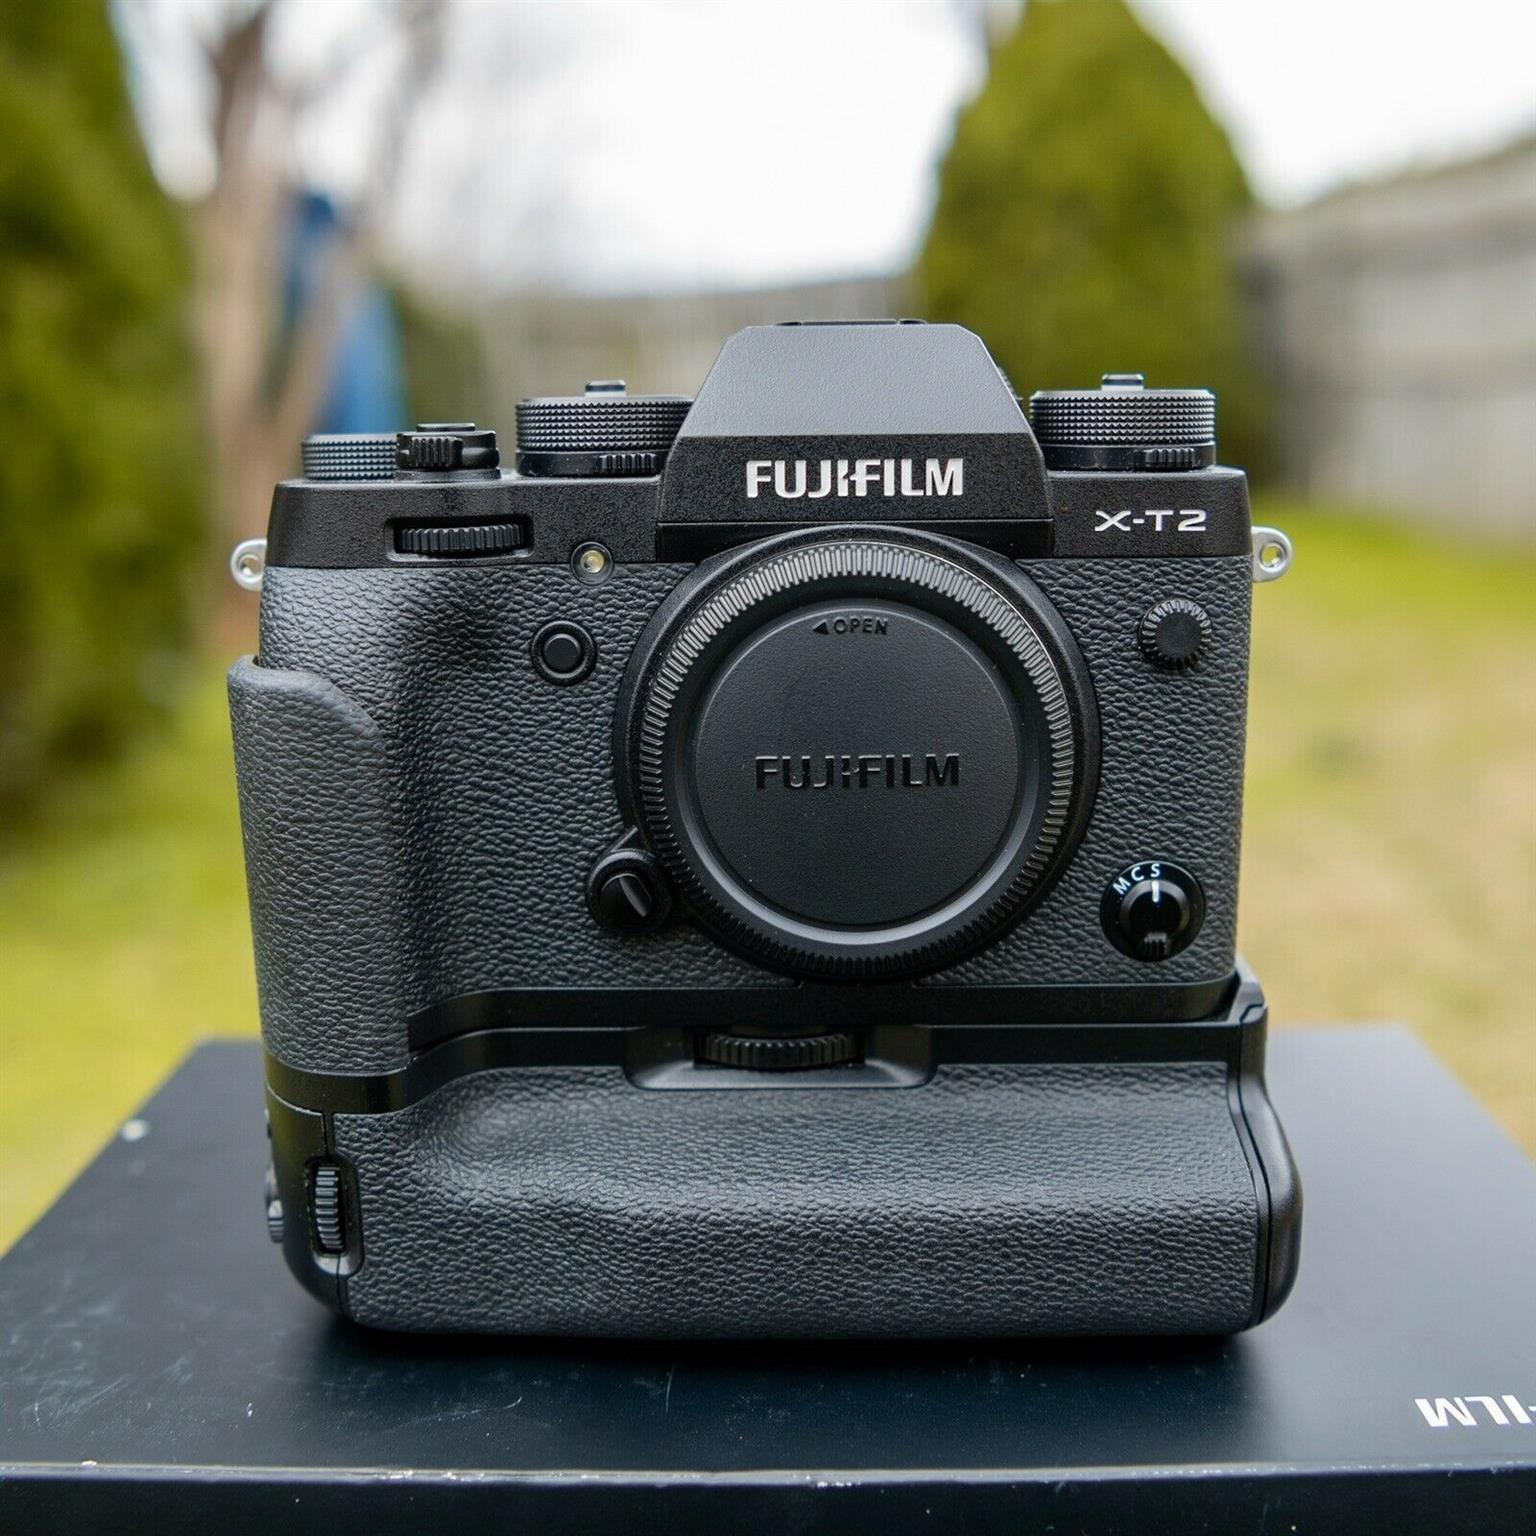 Preowned Fujifilm X-T2